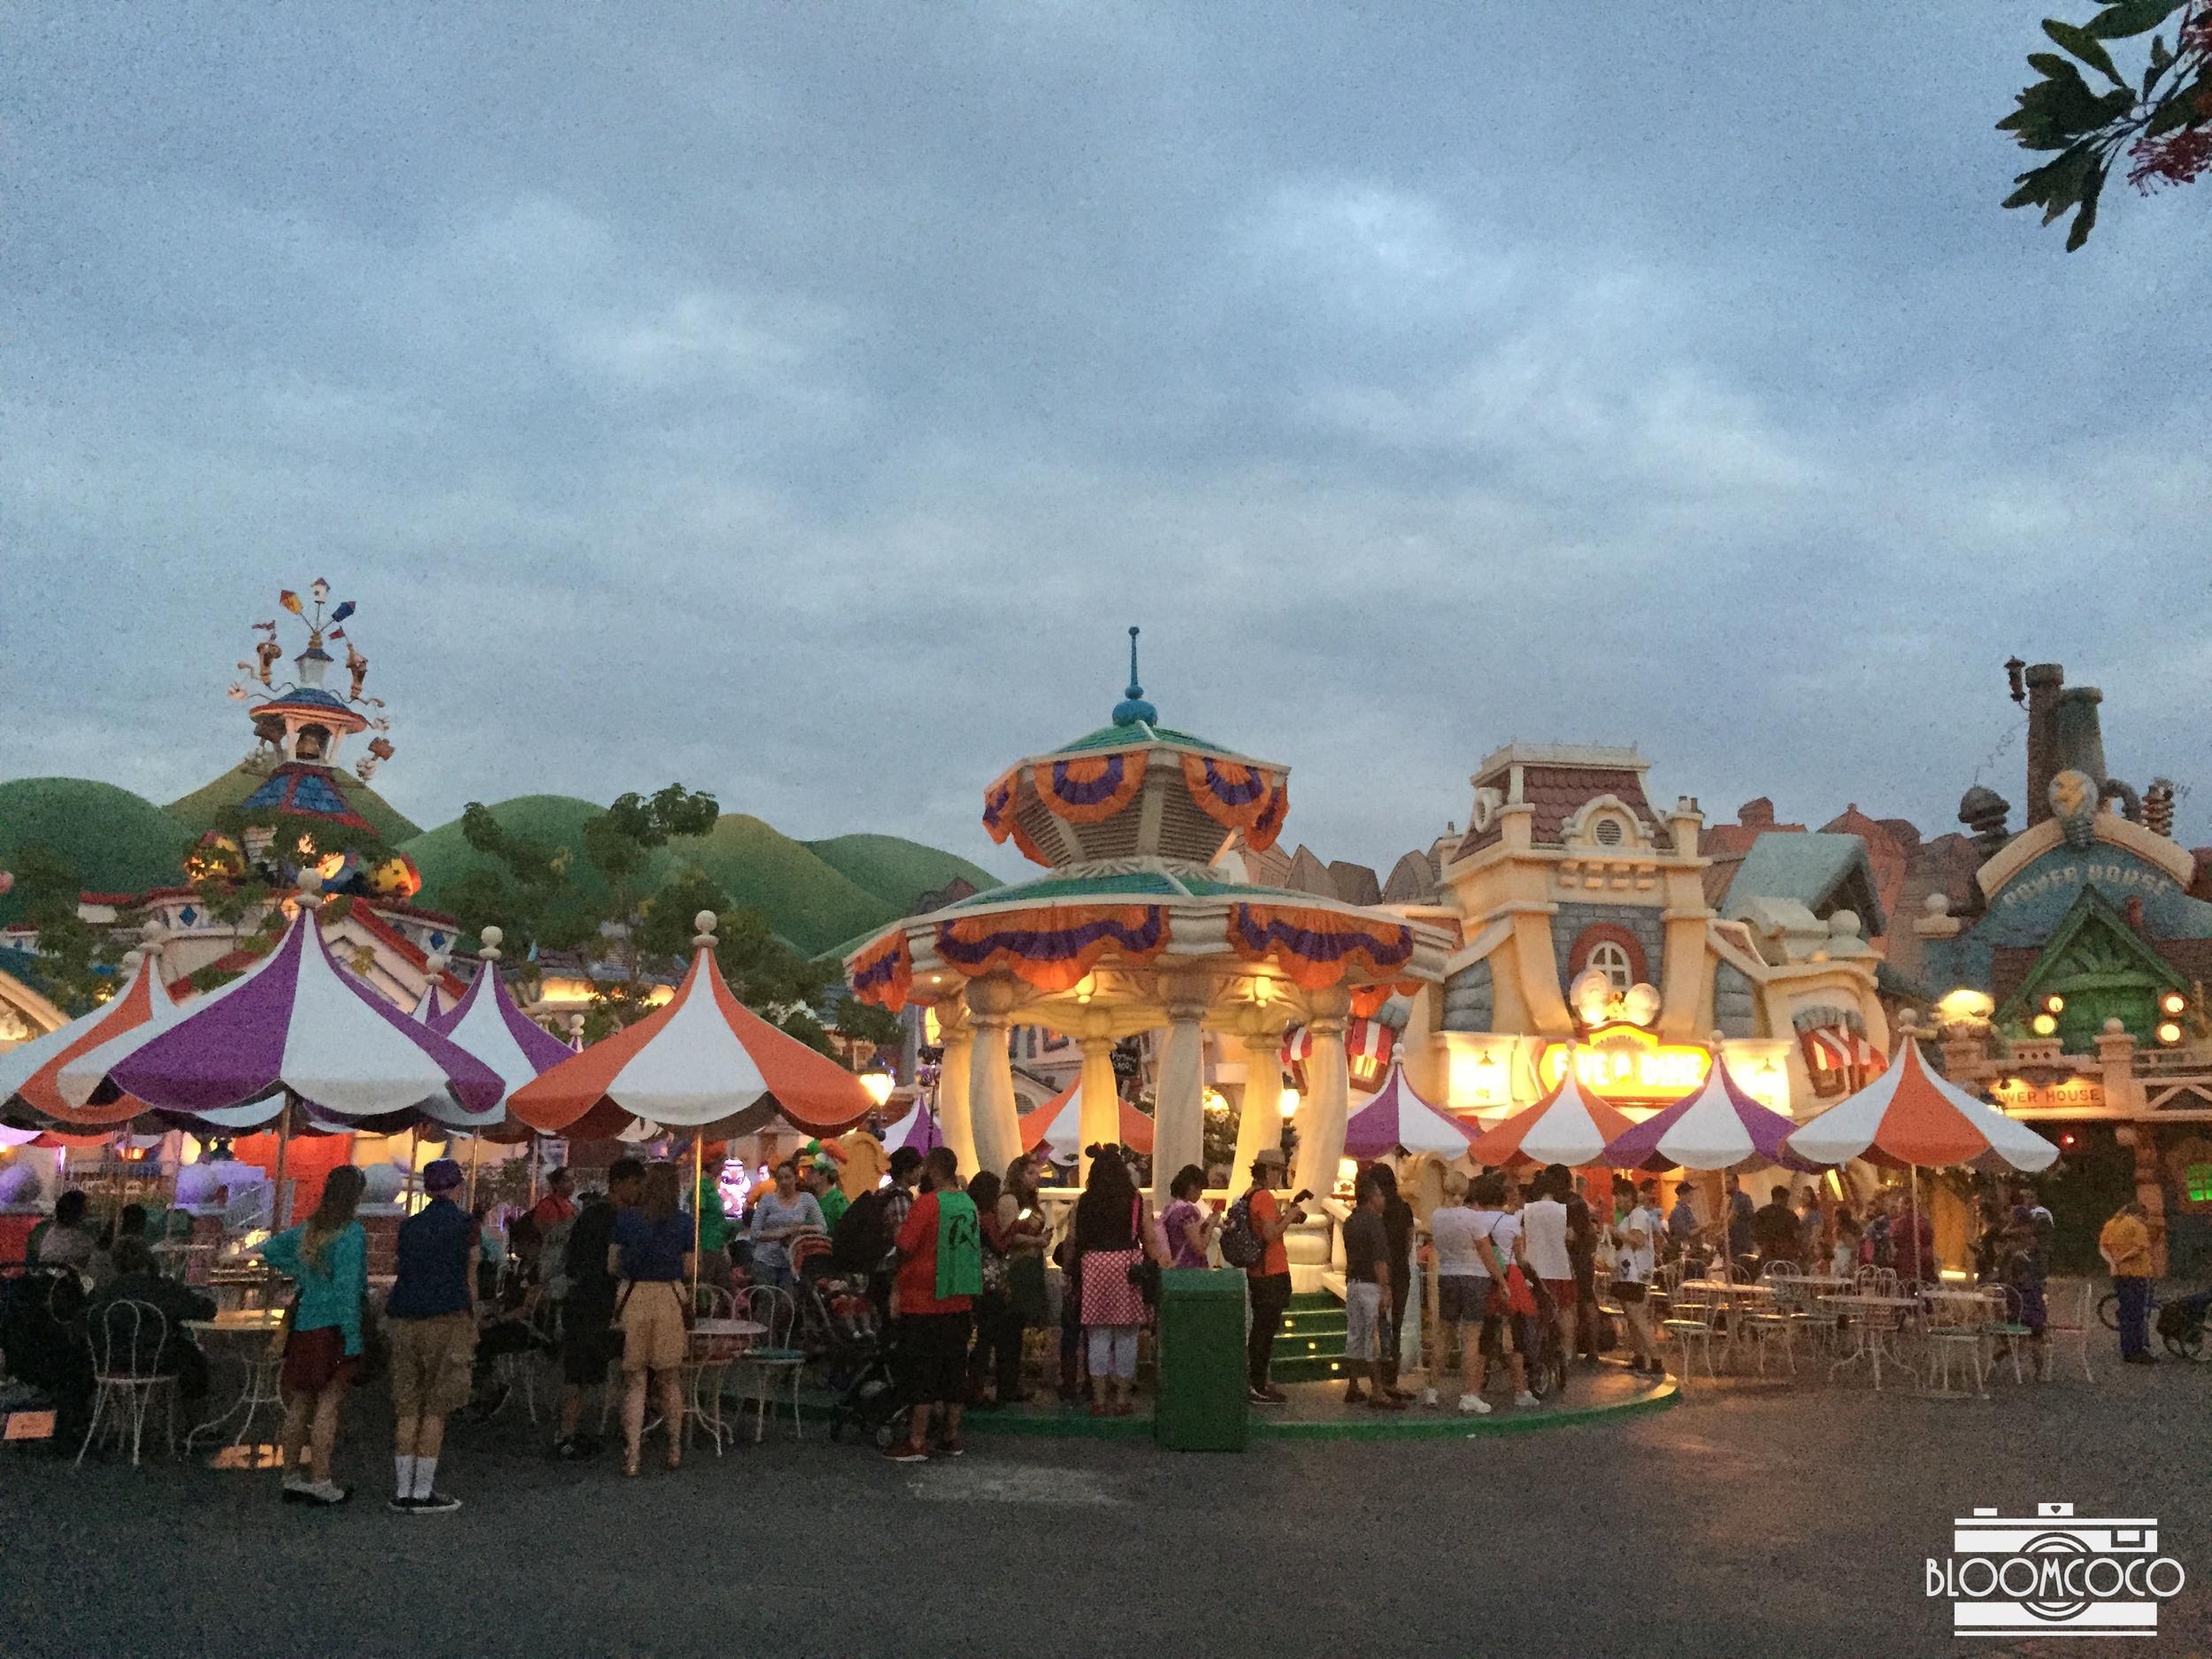 Mickey's Disneyland Party at Disneyland Park